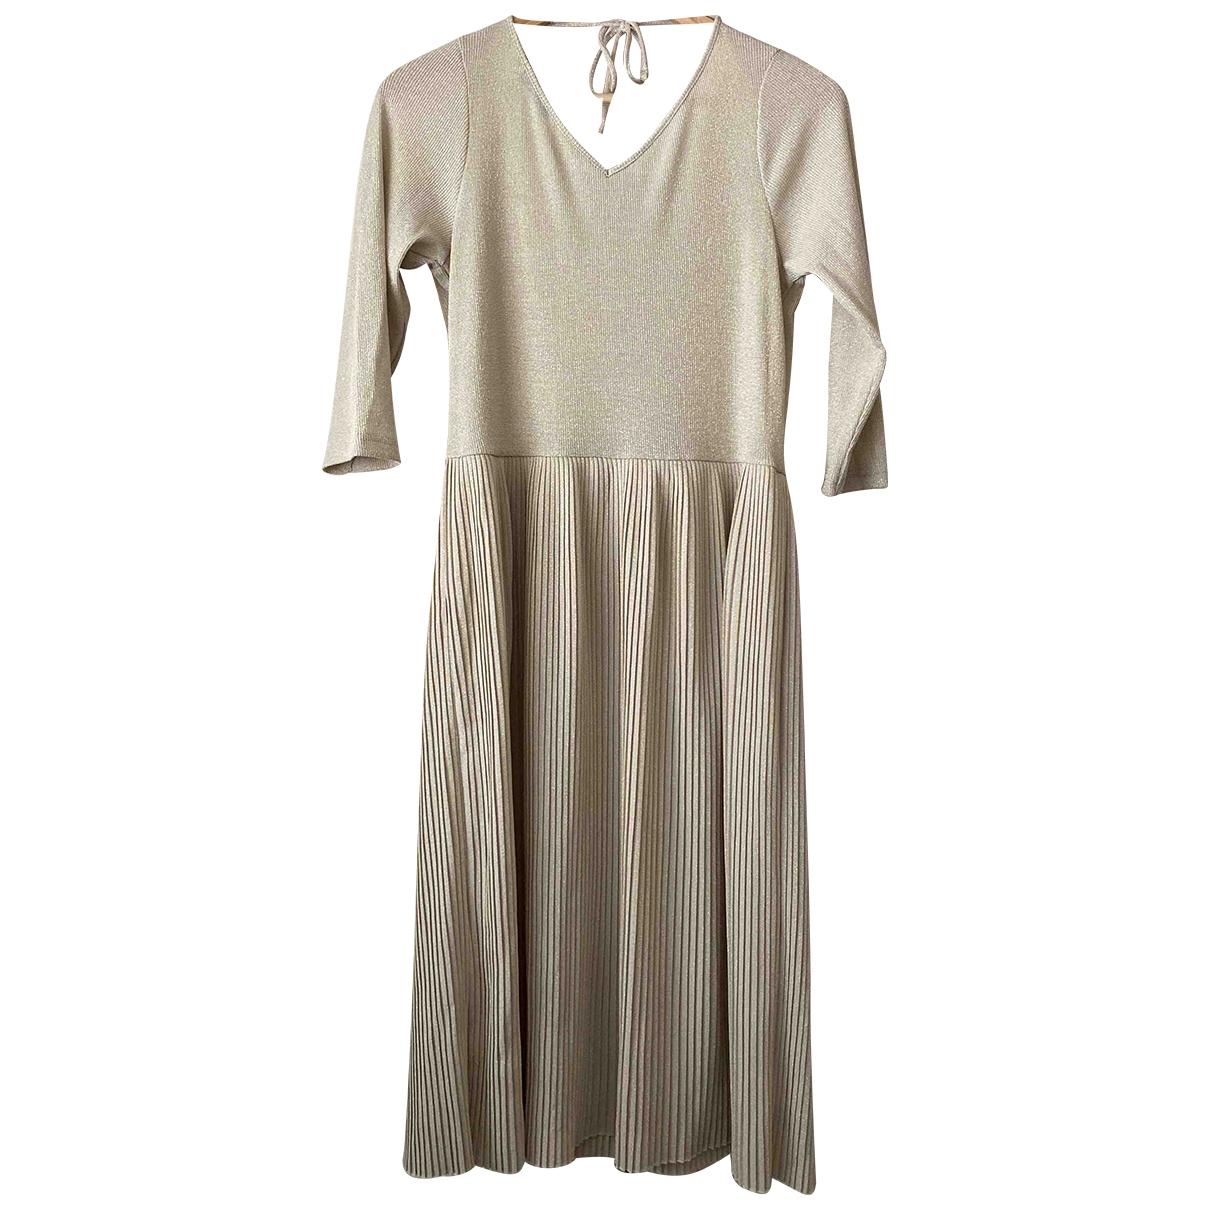 Mango \N Gold dress for Women M International